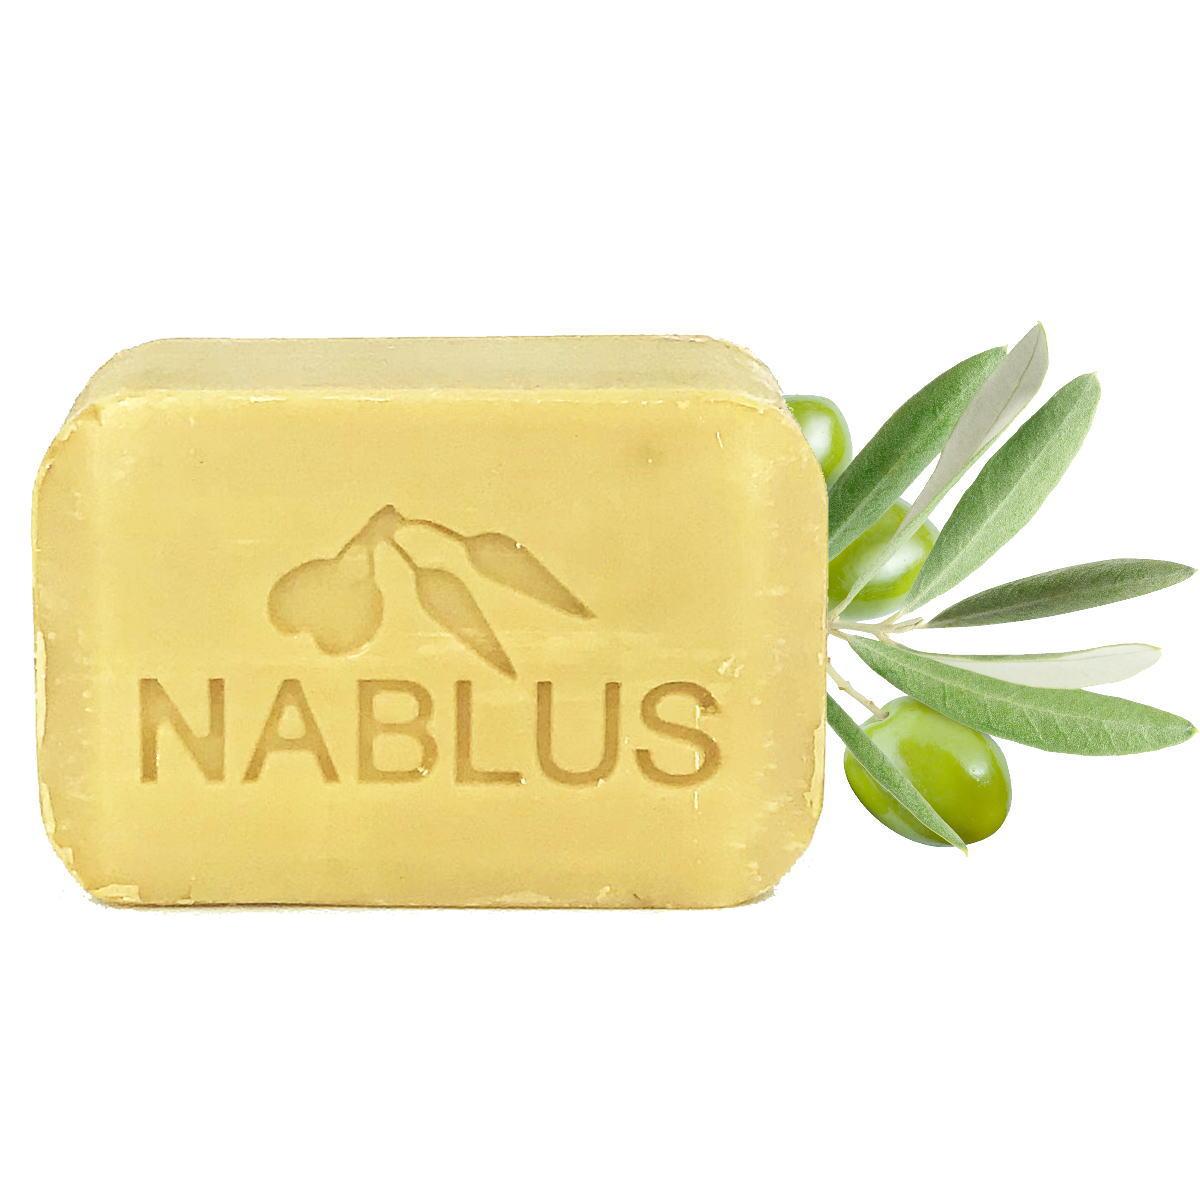 Nablus Soap ナーブルスソープ - ナチュラルオリーブオイル - 無添加 オーガニック石鹸